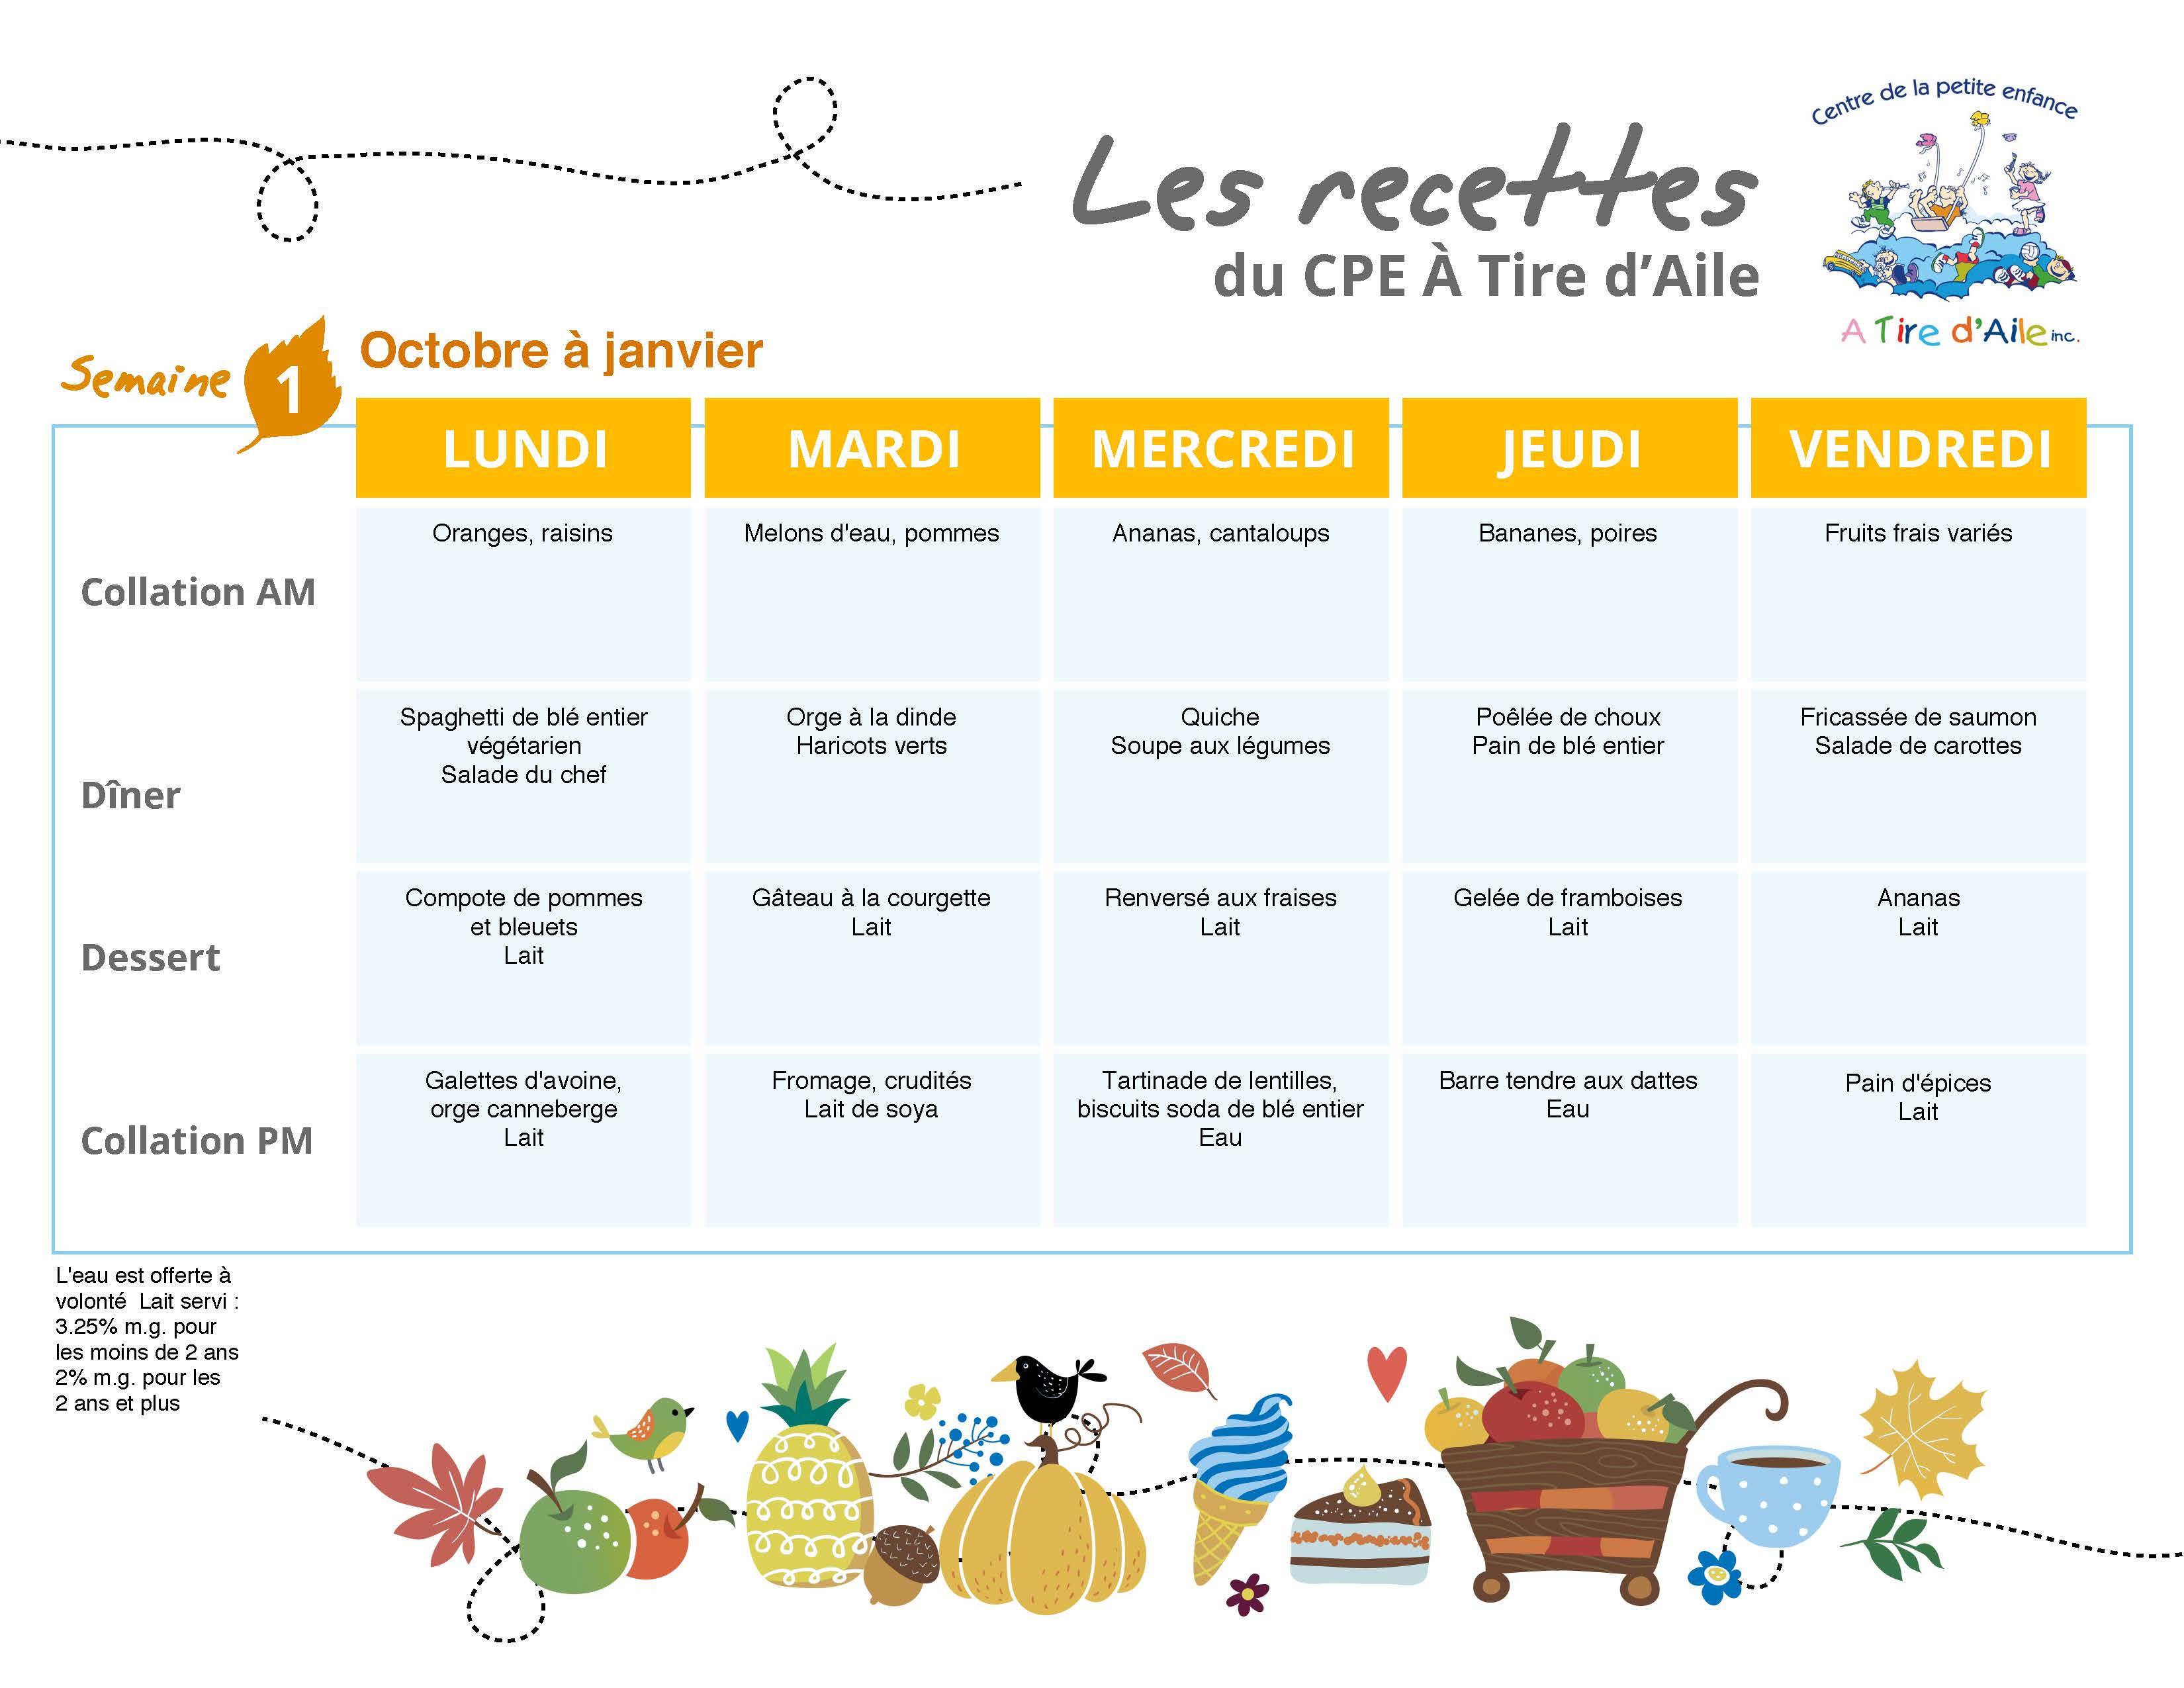 CPETA-18925_menus _04_automne-hiver_Page_1